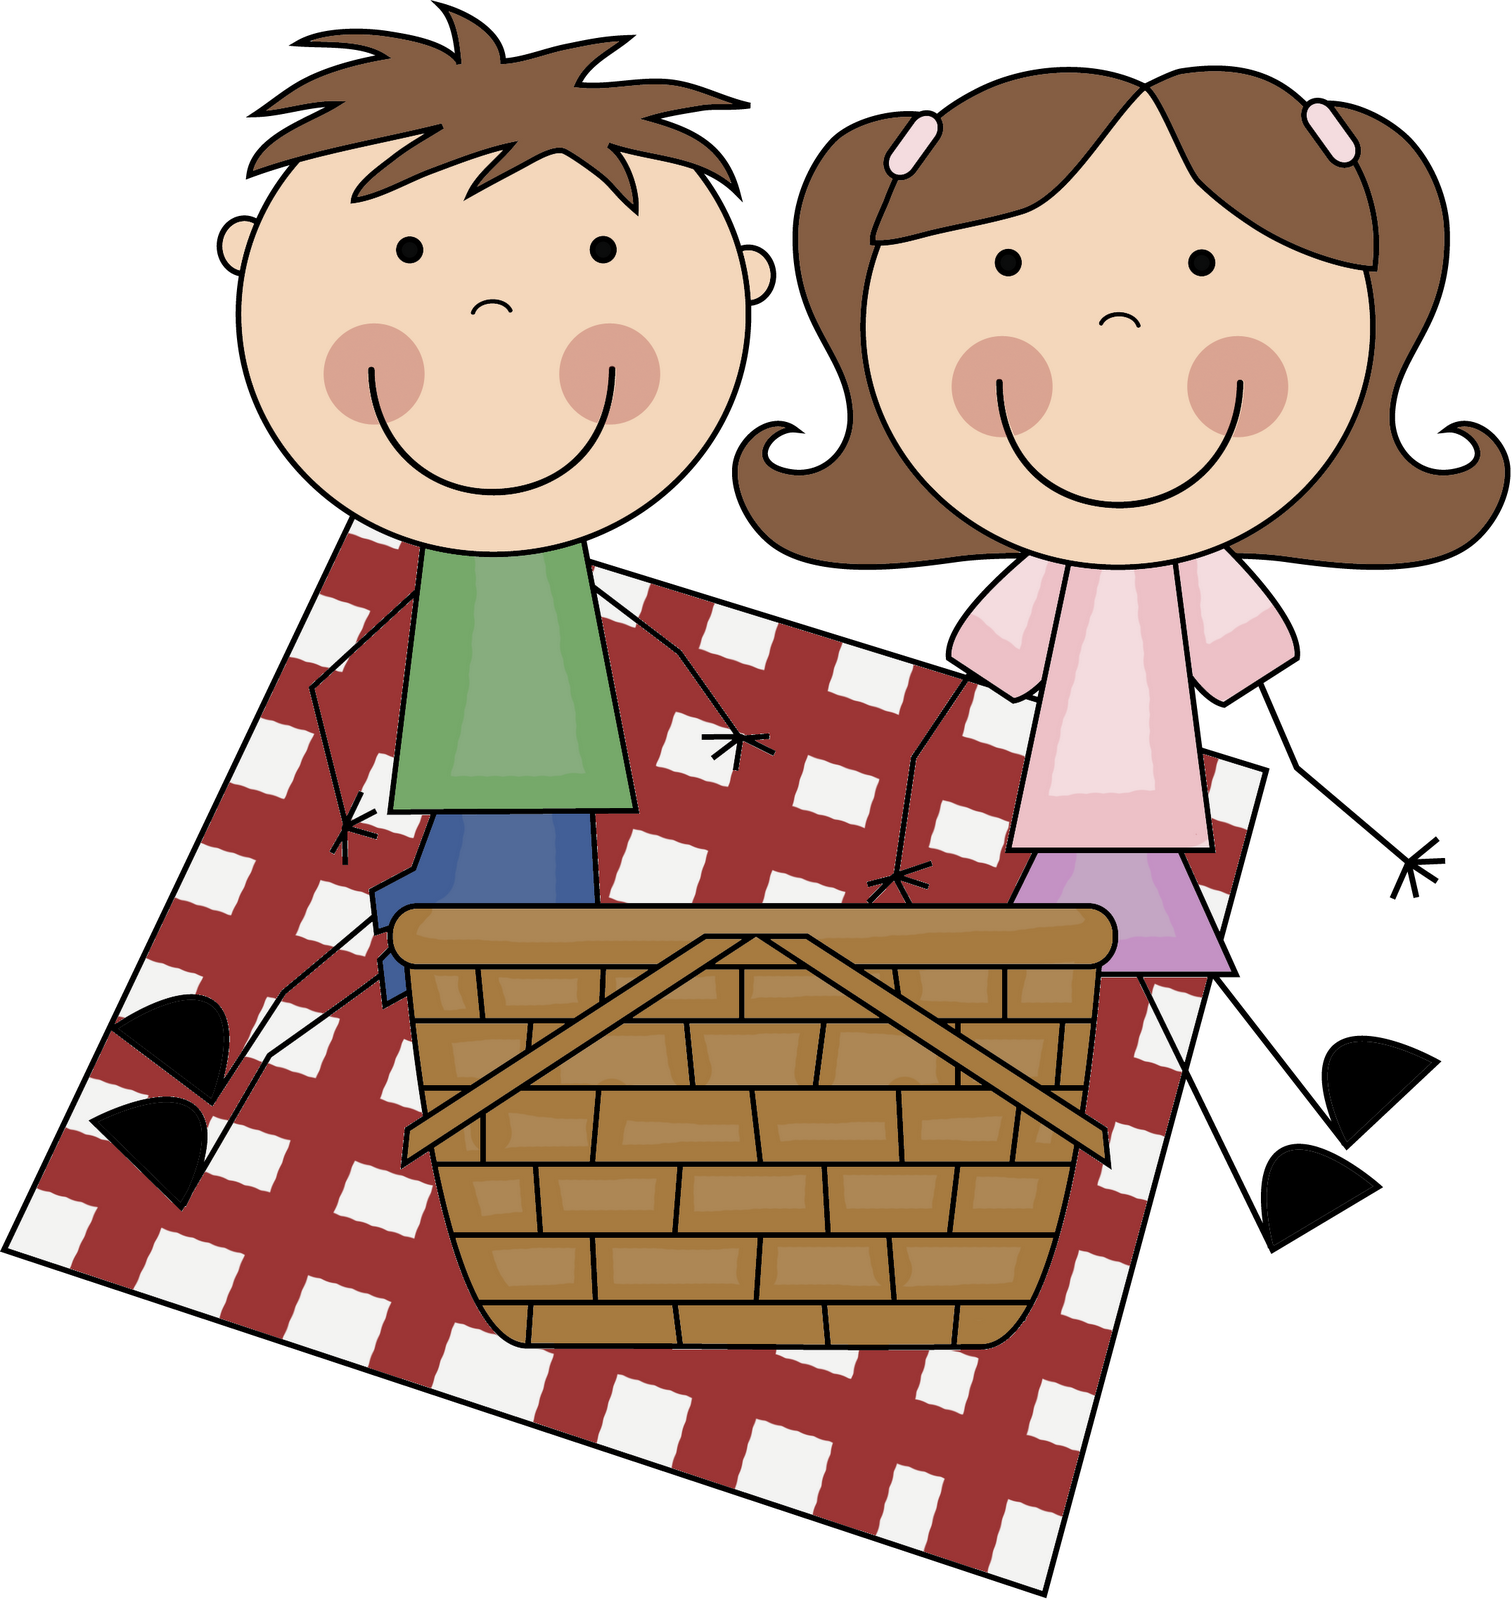 image free download Boarder clipart picnic. Summer borders panda free.